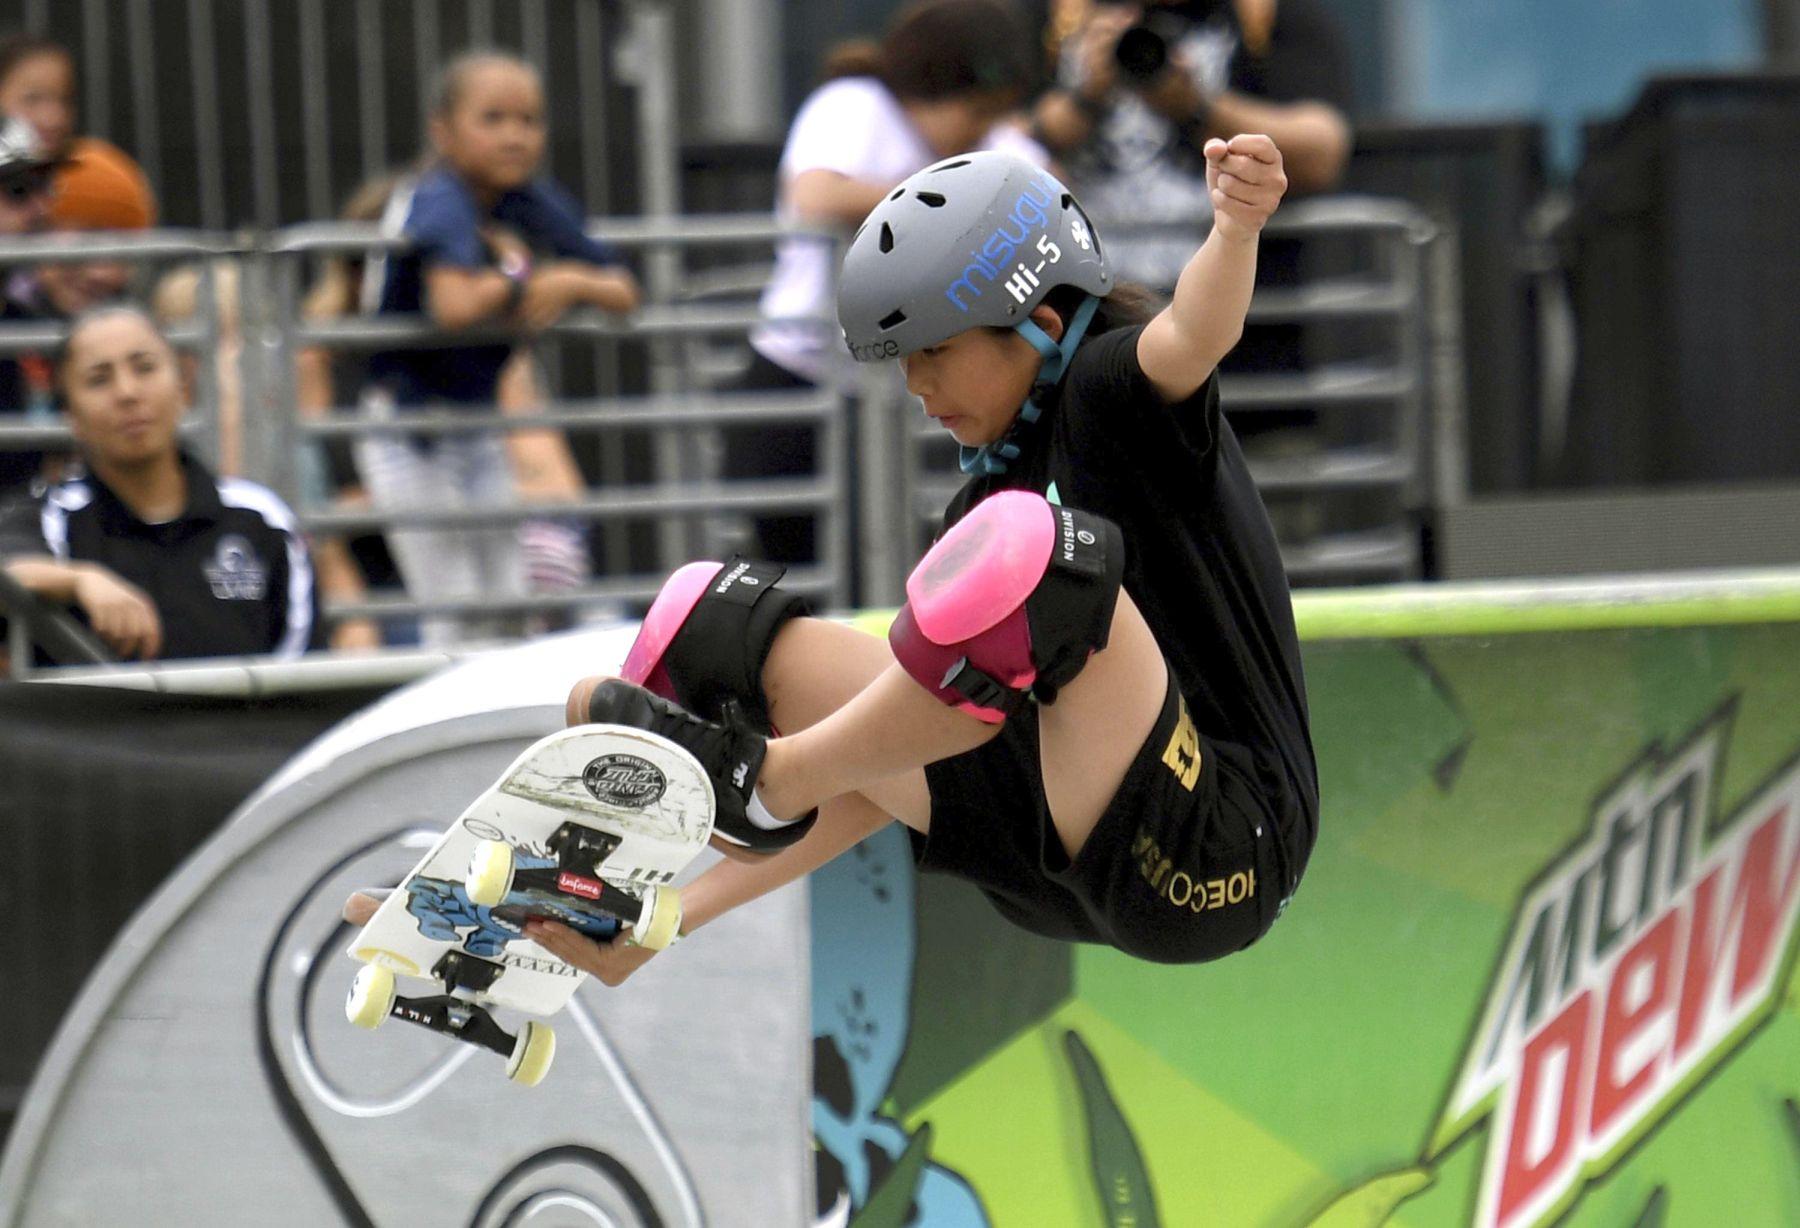 Misugu Okamoto Japan Wins in the Womens Park Skateboard Final 005